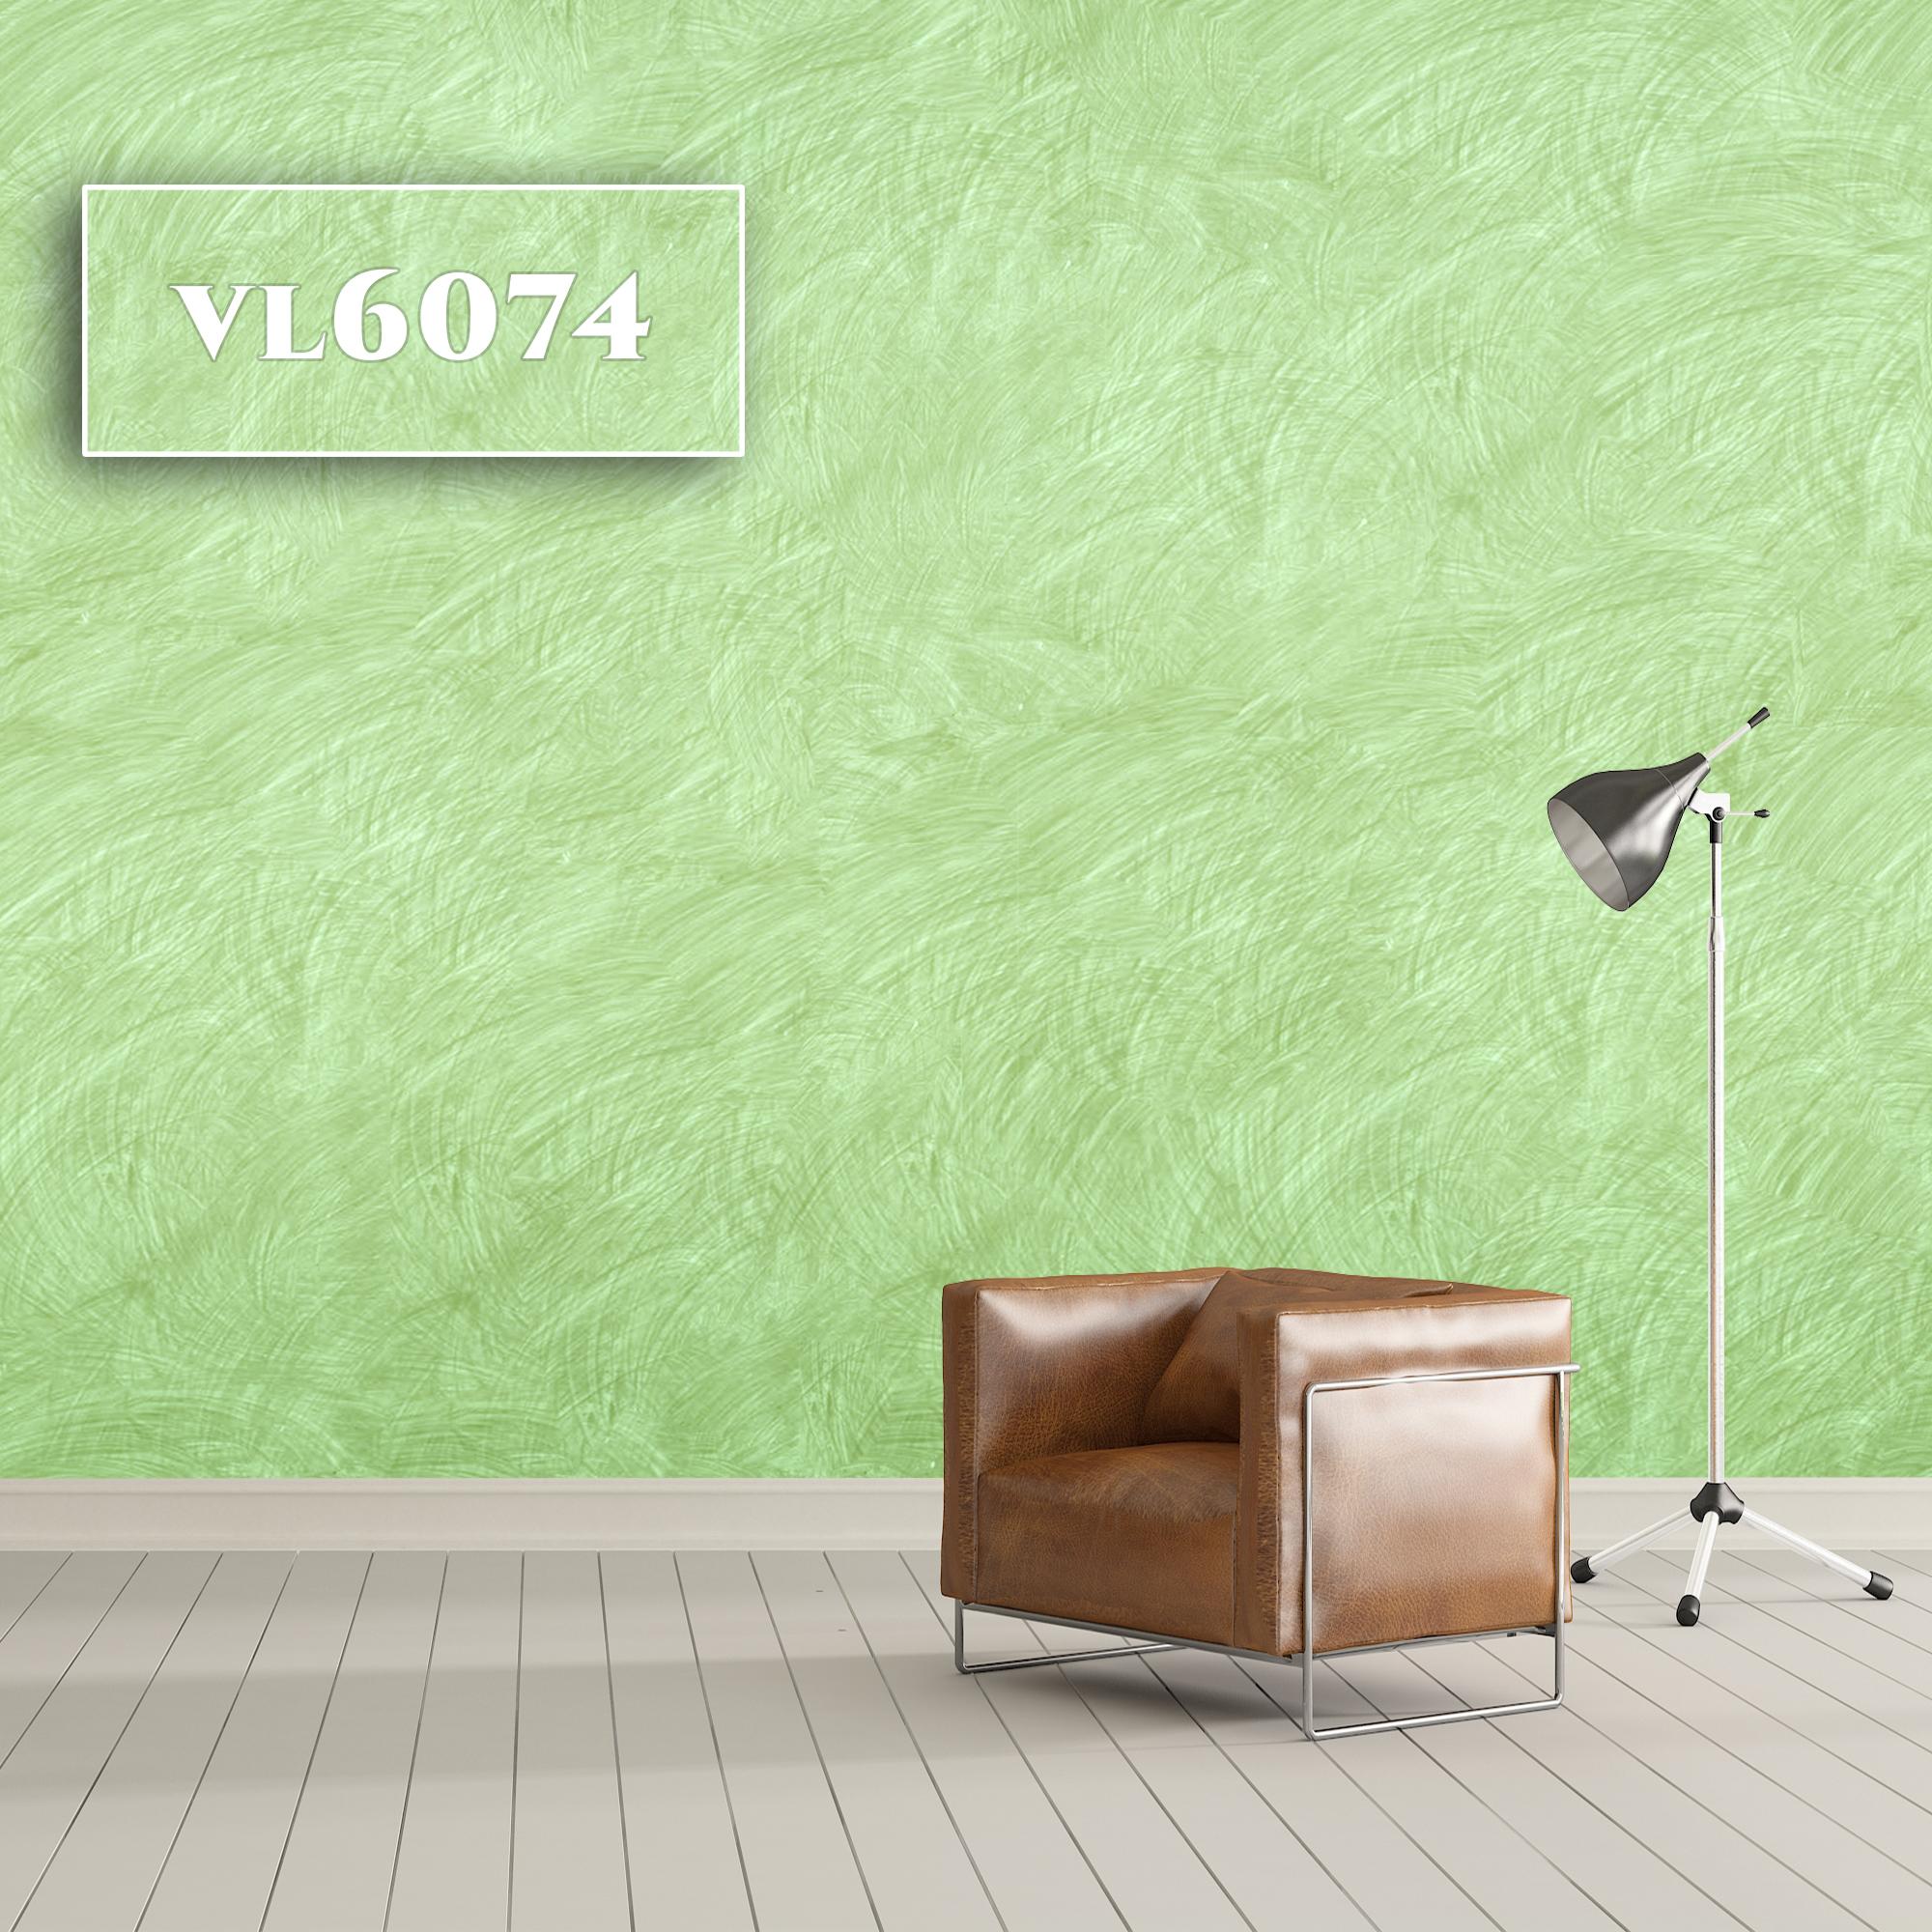 VL6074